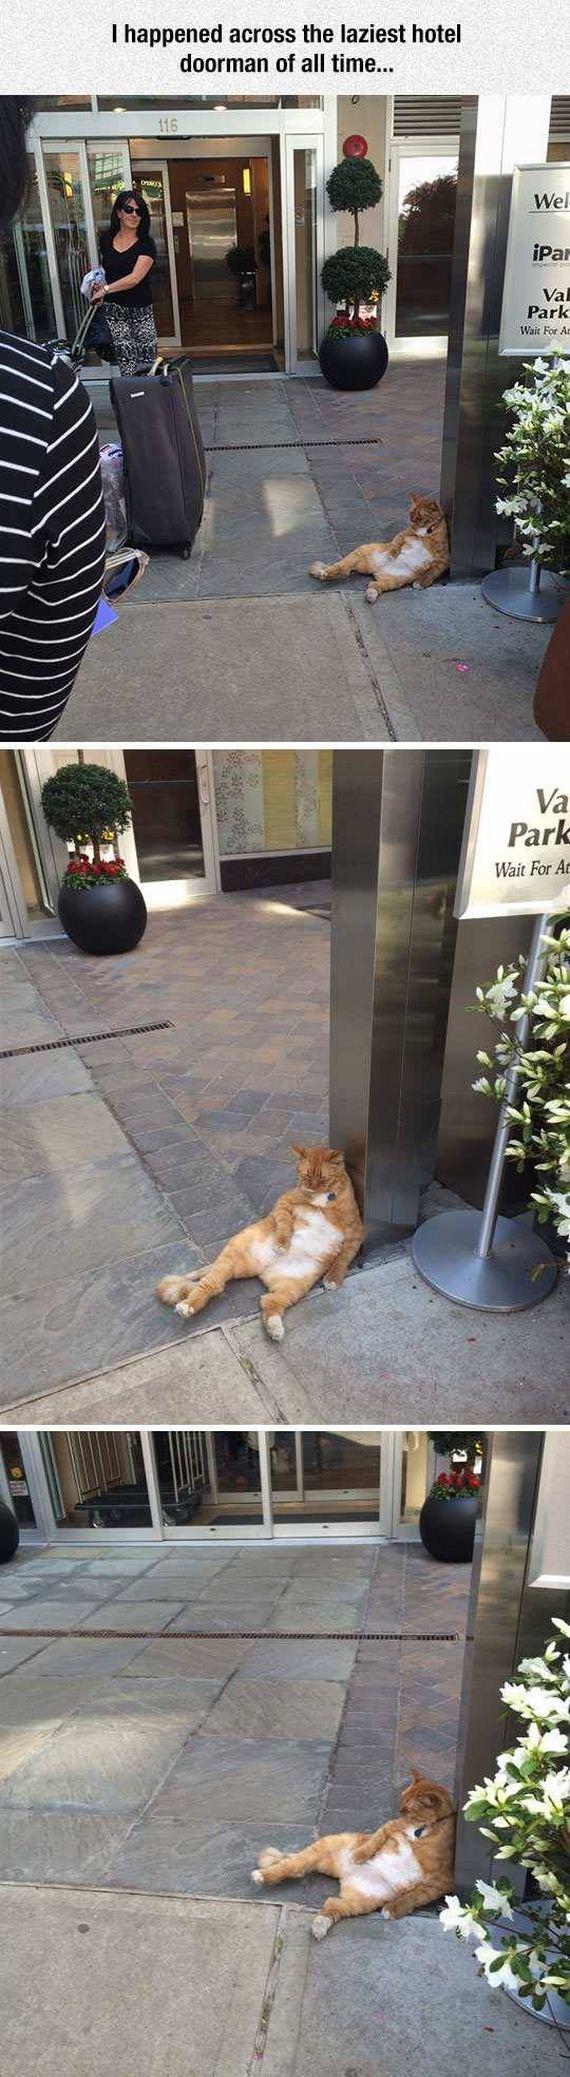 hotel_humor